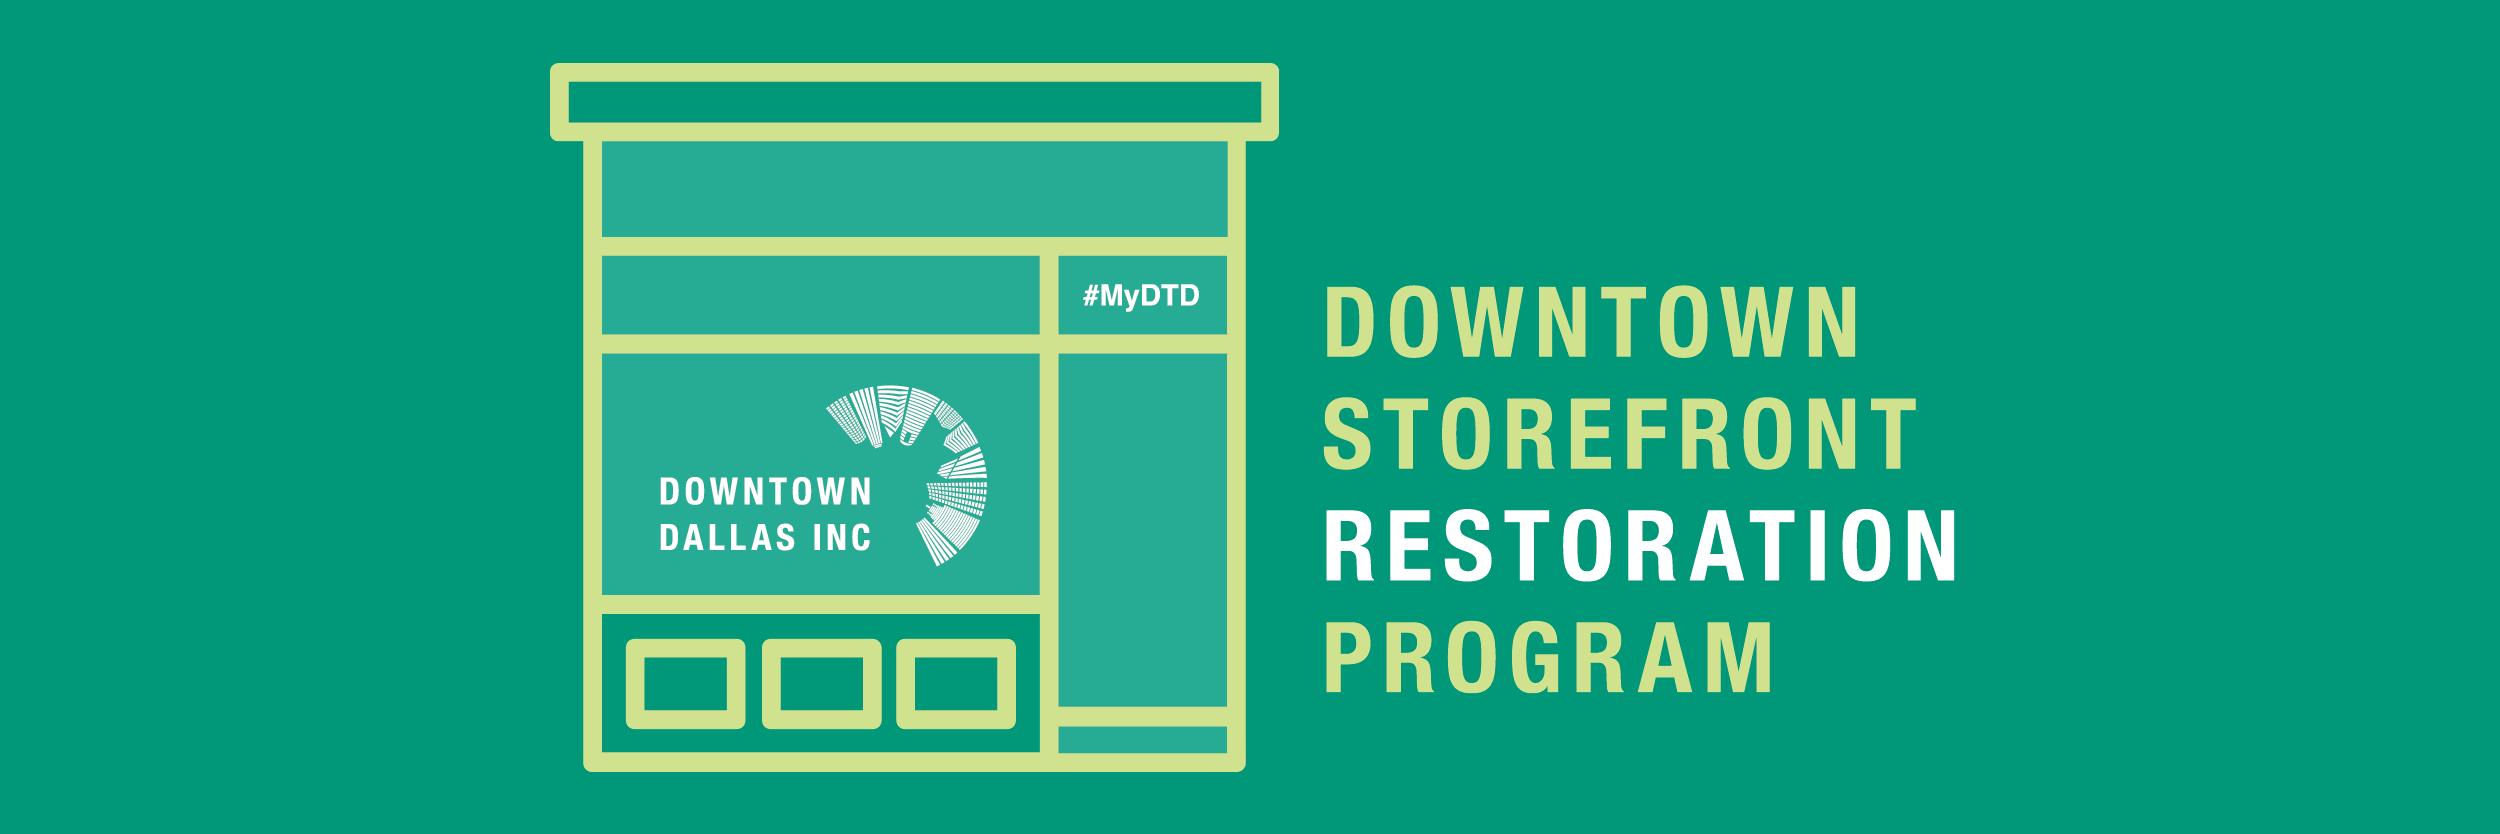 Downtown Storefront Restoration-600x200 Email Header